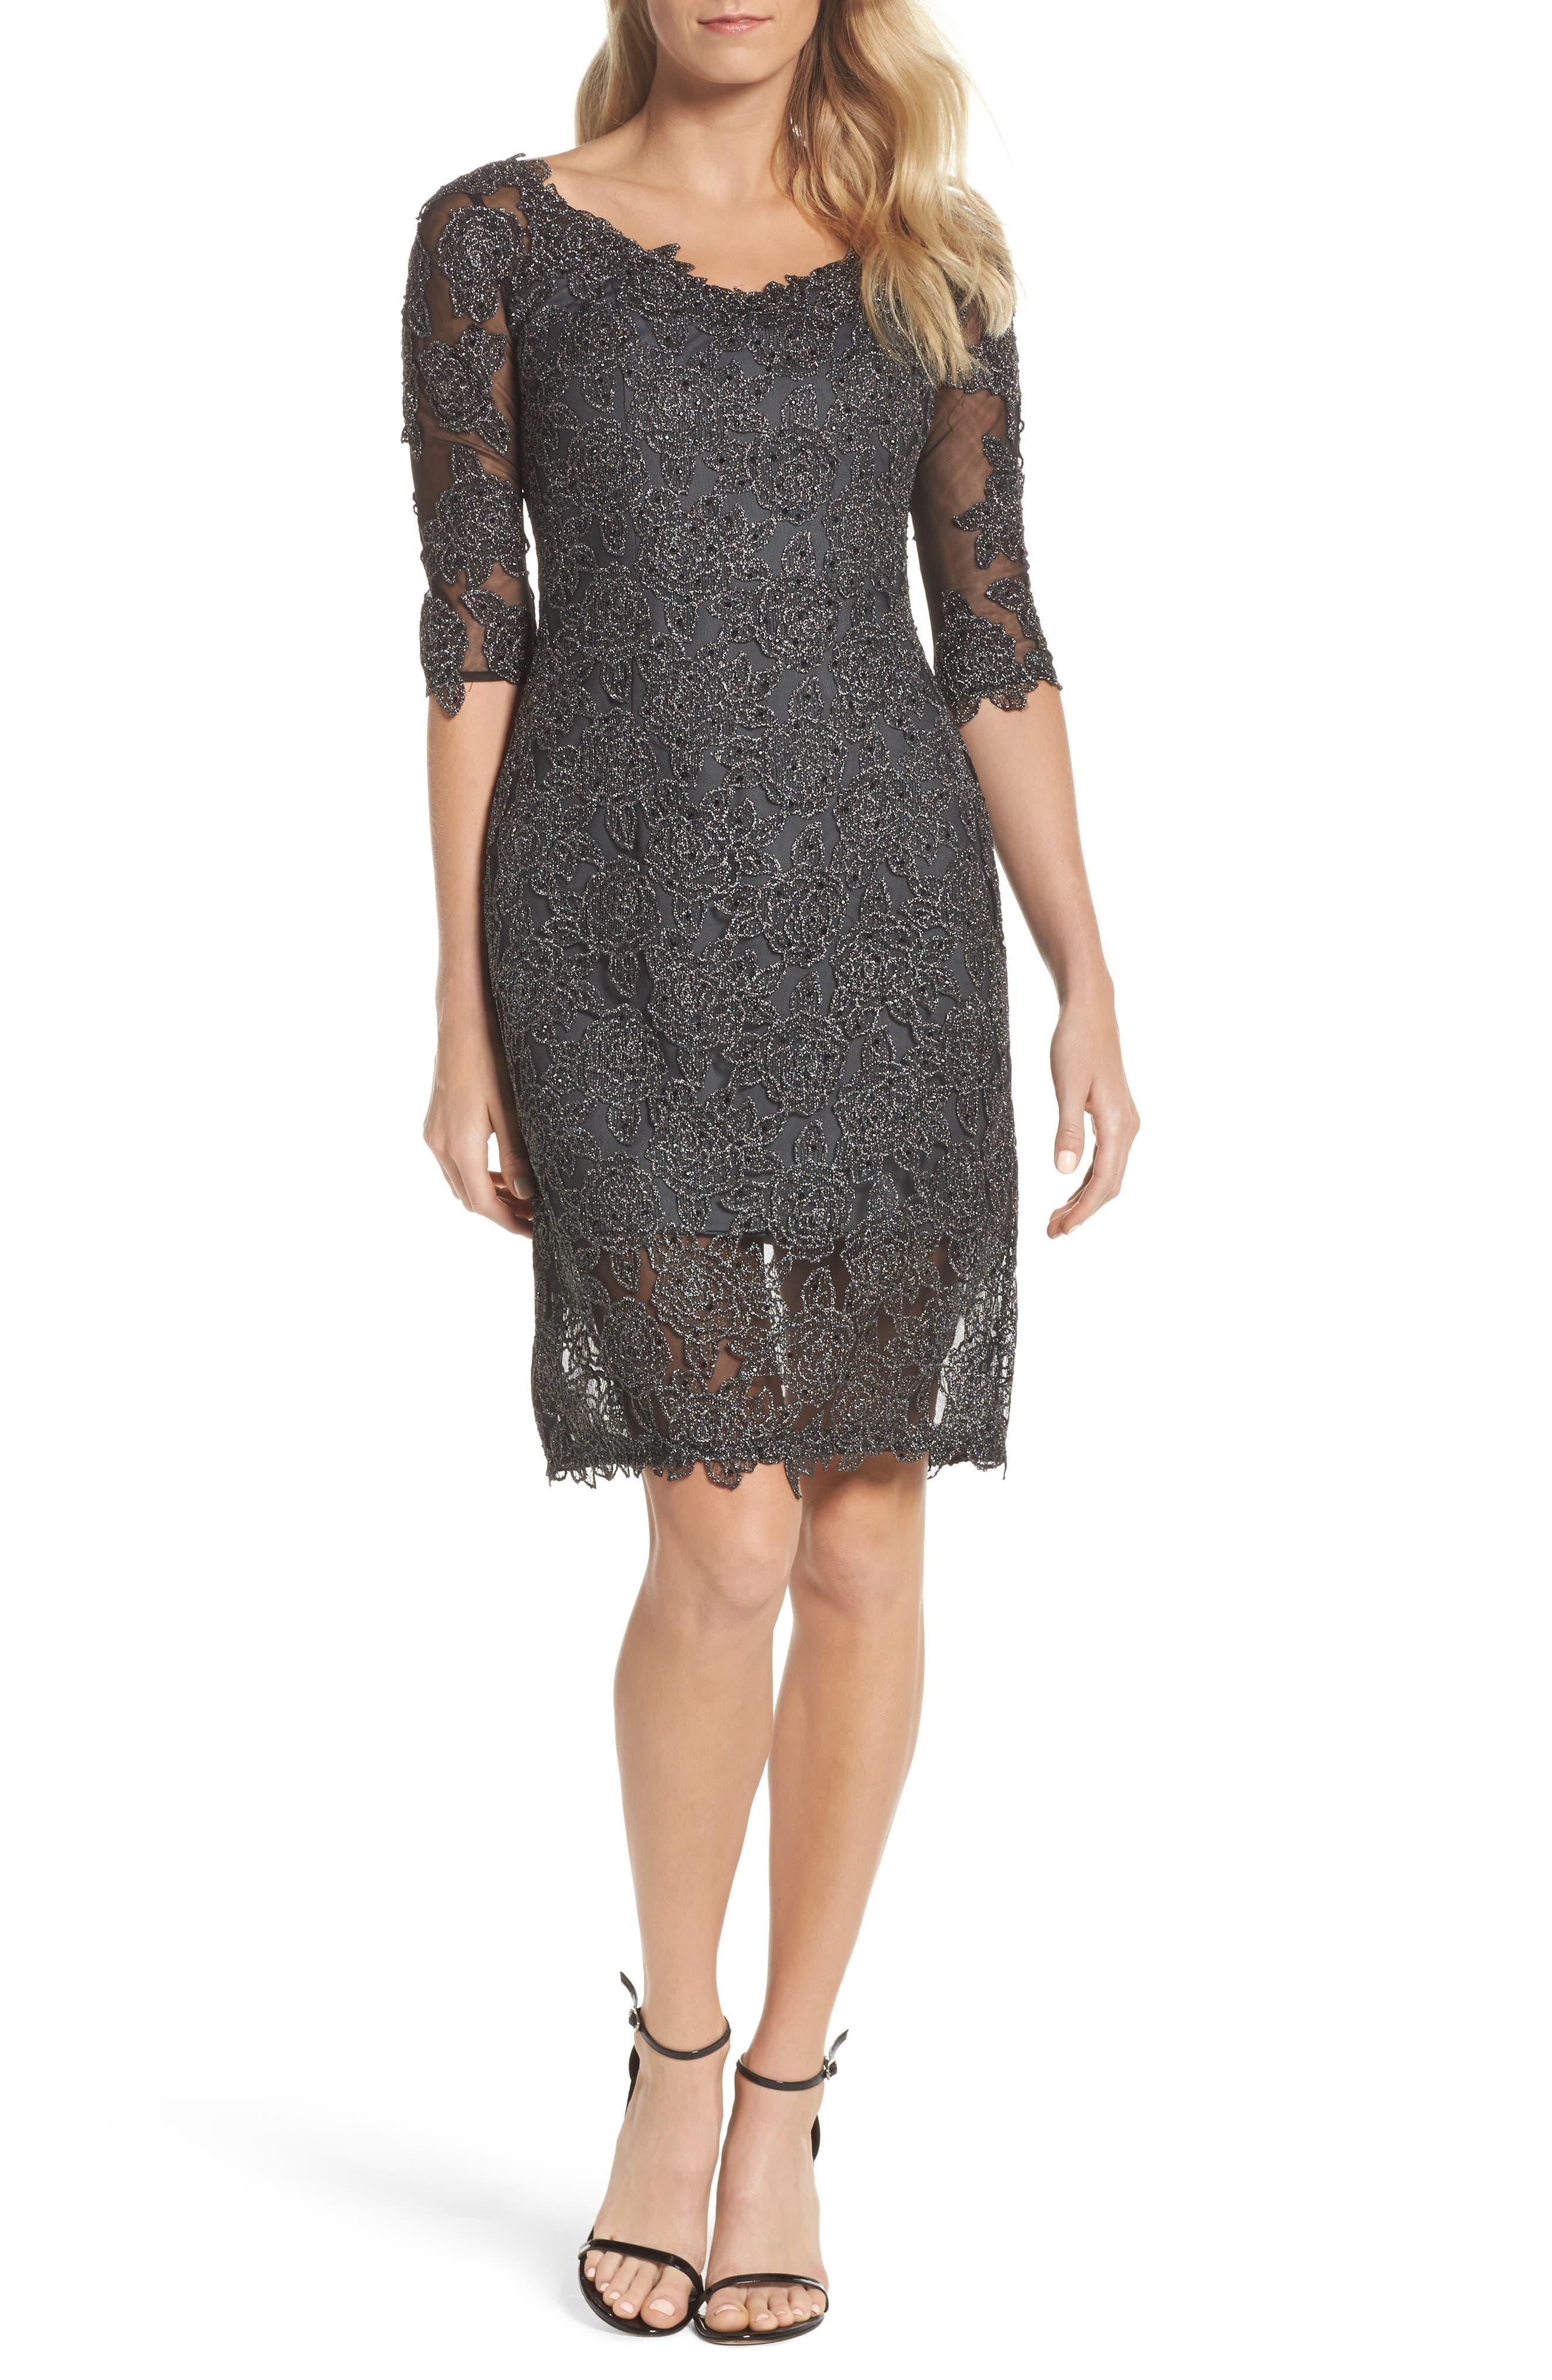 La Femme Lace Sheath Dress, Metallic